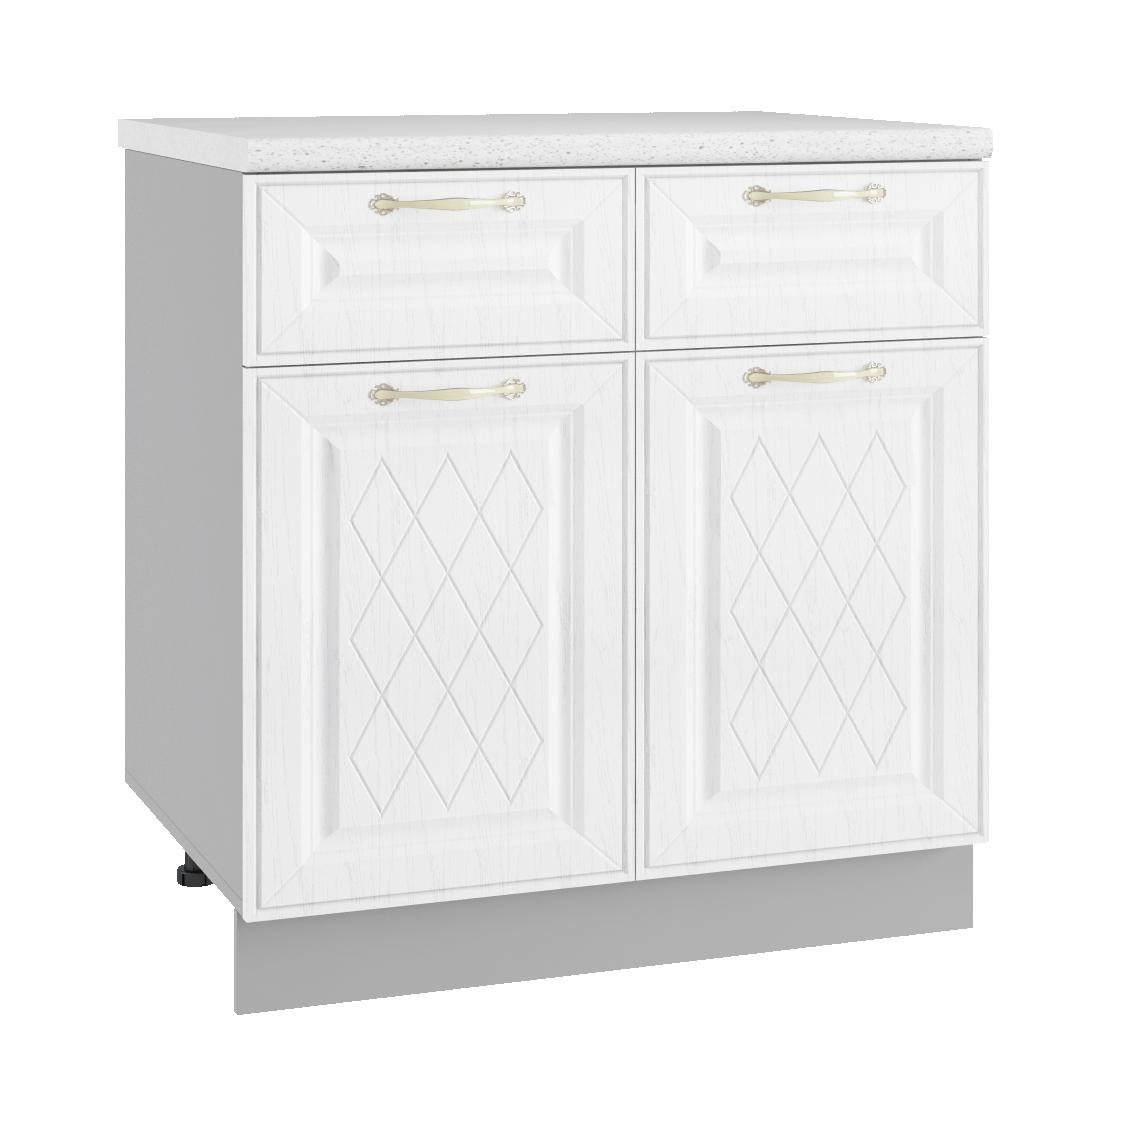 Кухня Вита С2Я 800 Шкаф нижний с 2 ящиками